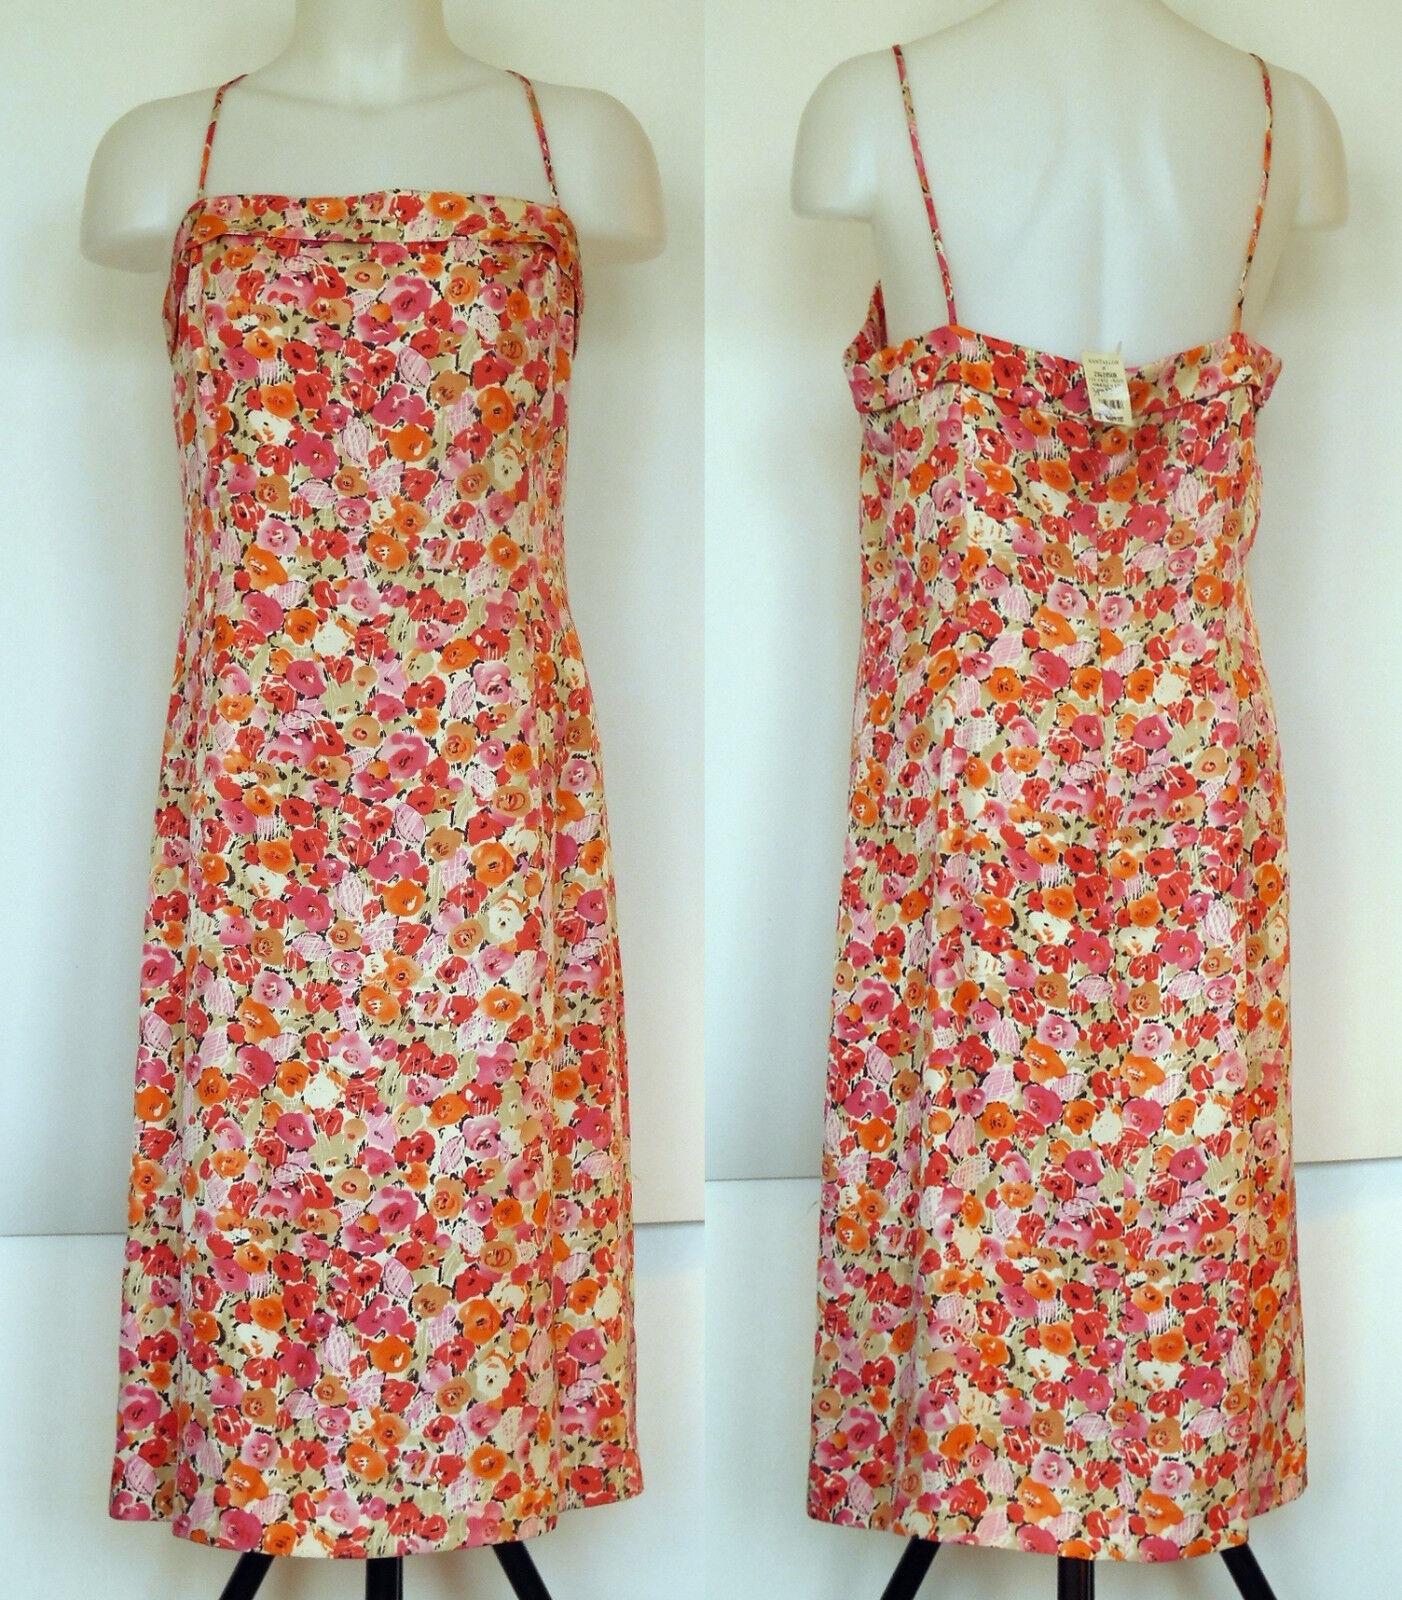 NEW Ann Taylor Pink & Coral Floral Silk Lined Sheath Dress w Spaghetti Straps 12